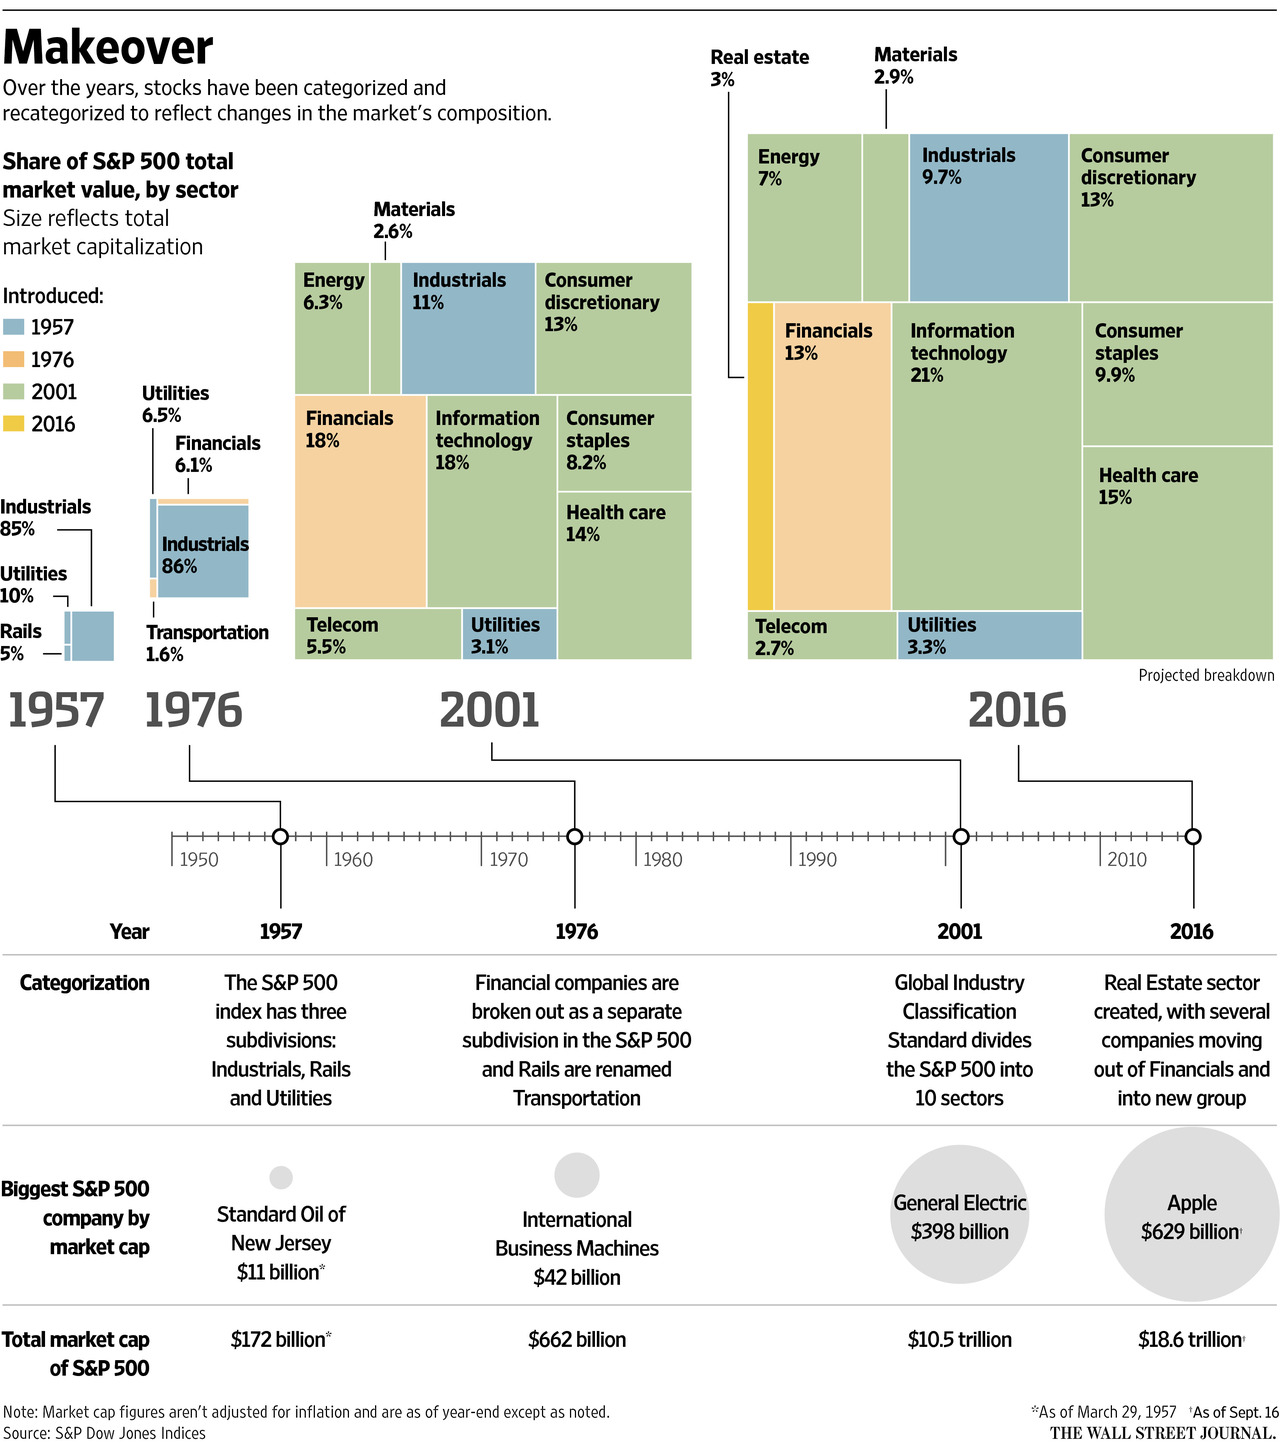 Vývoj sektorového rozdělení indexu S&P 500 do roku 2016, zdroj: The Wall Street Journal